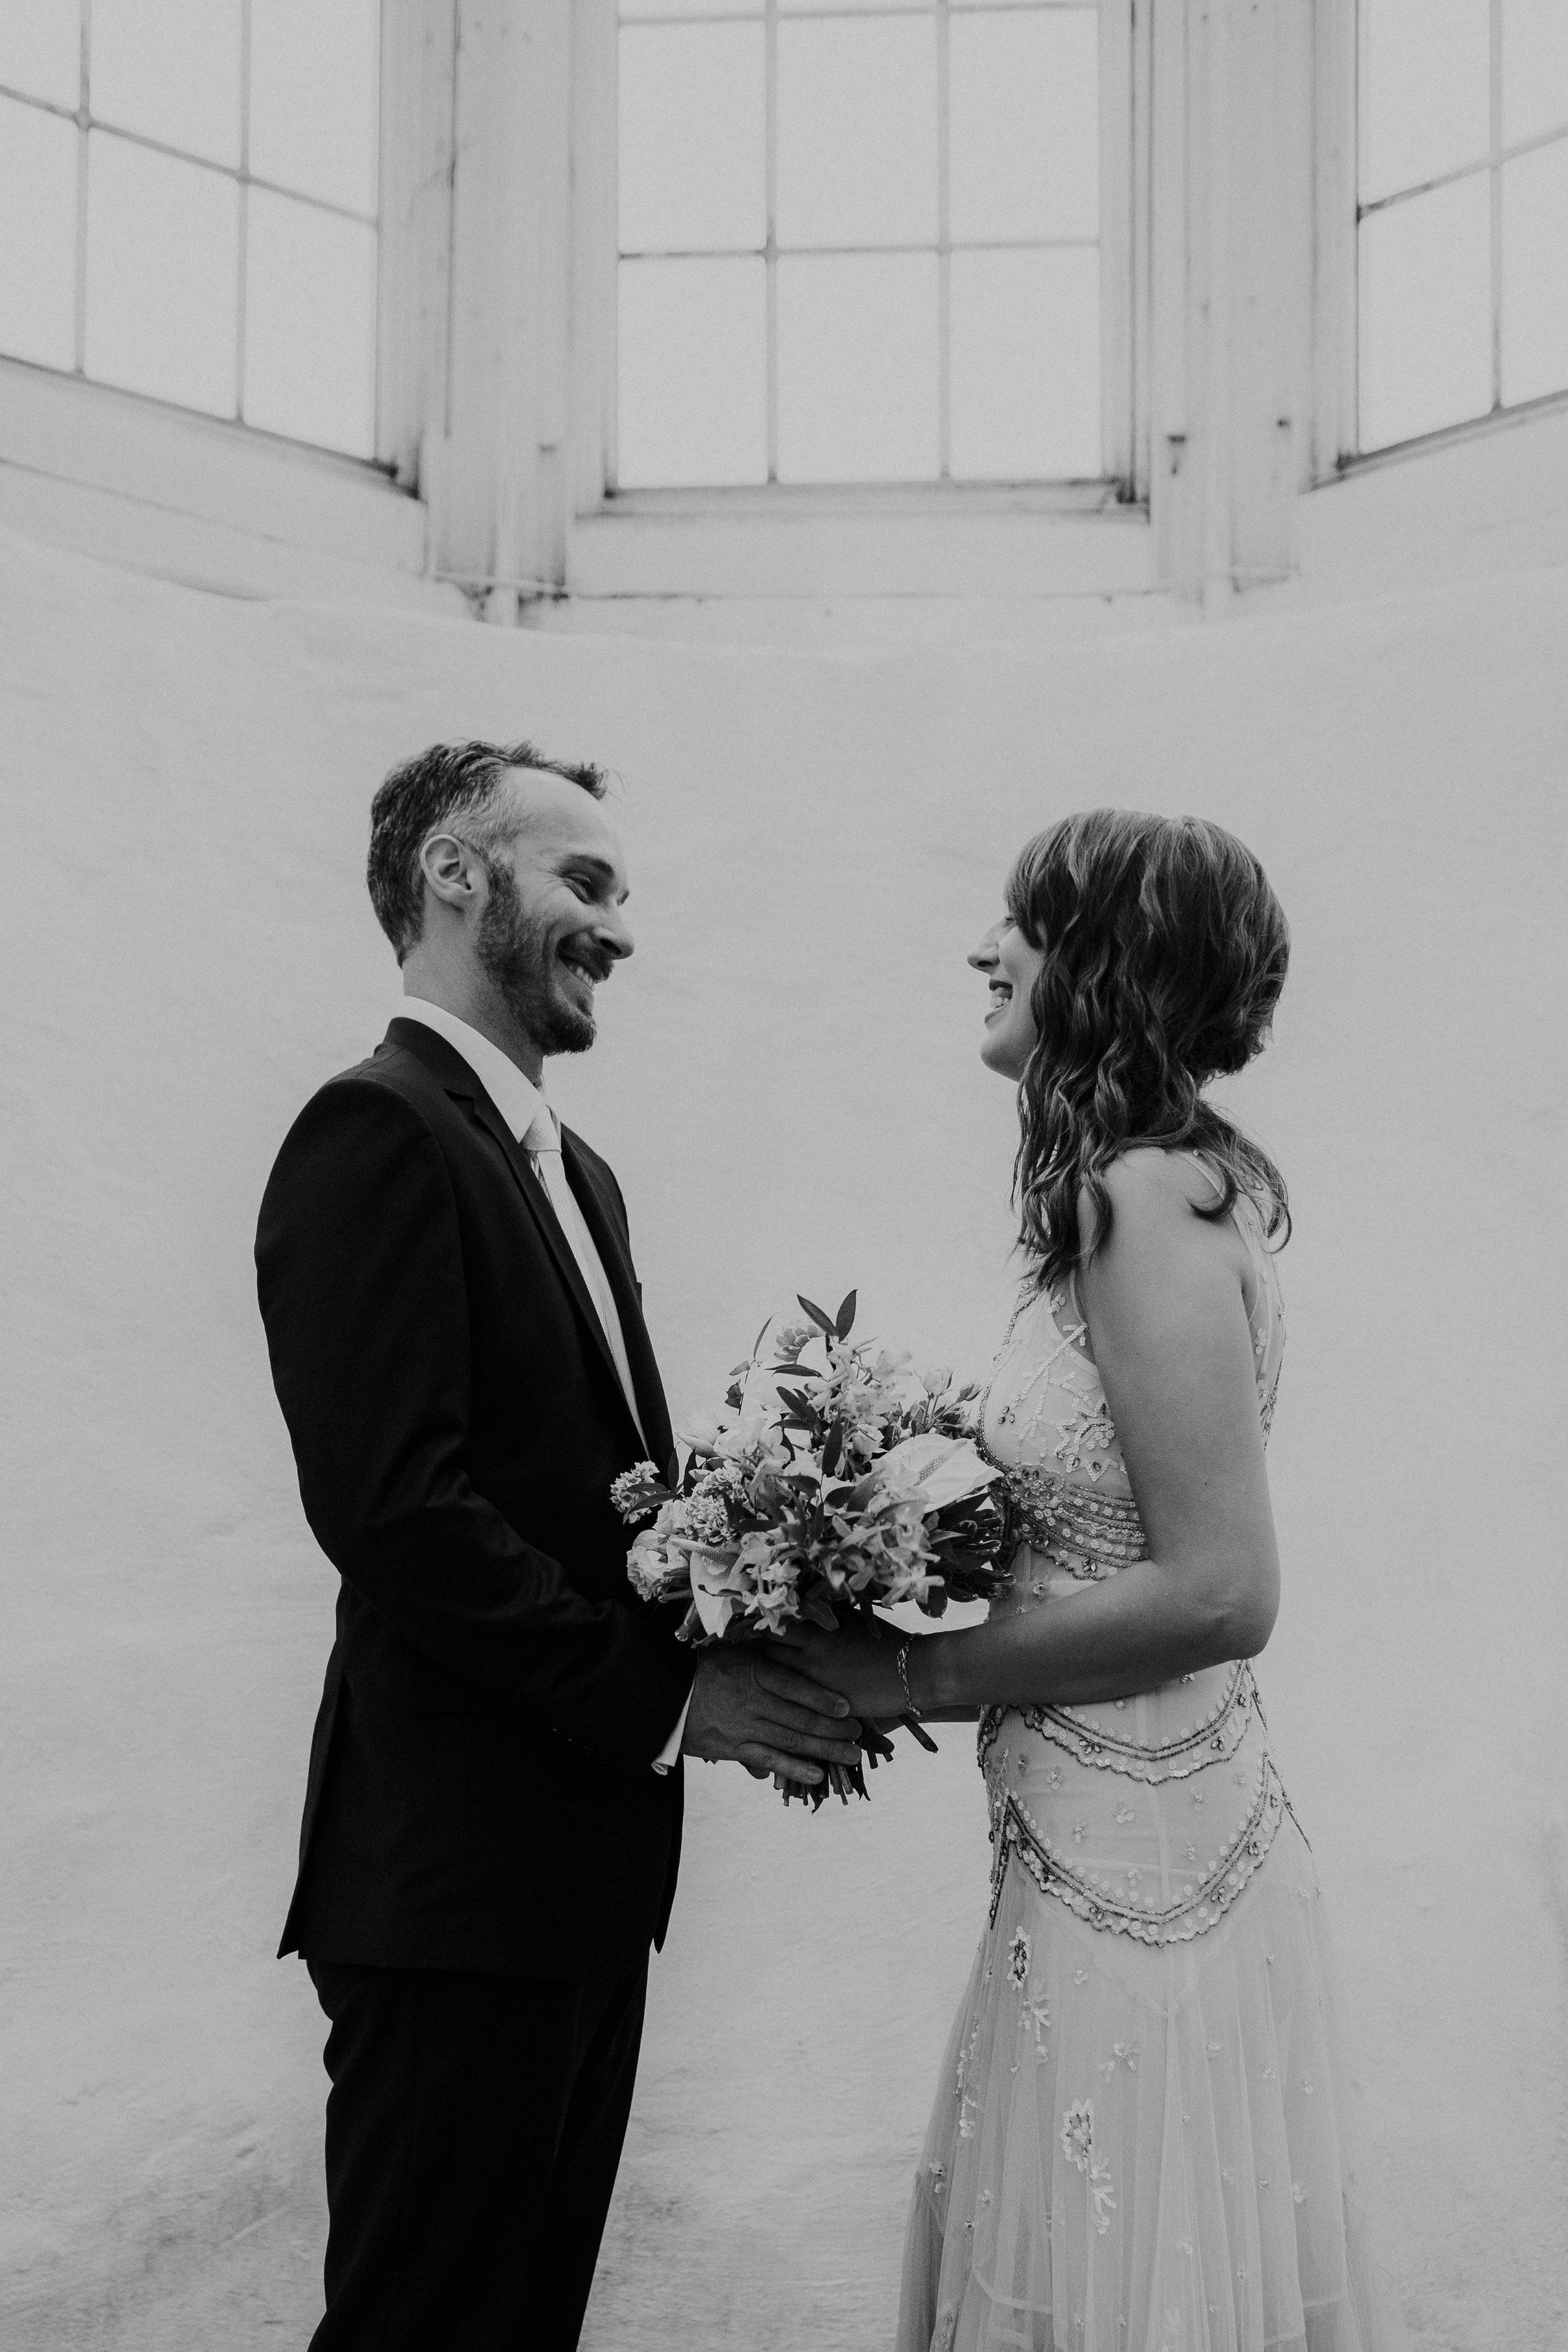 franklin park conservatory wedding columbus ohio wedding photographer grace e jones photography46.jpg